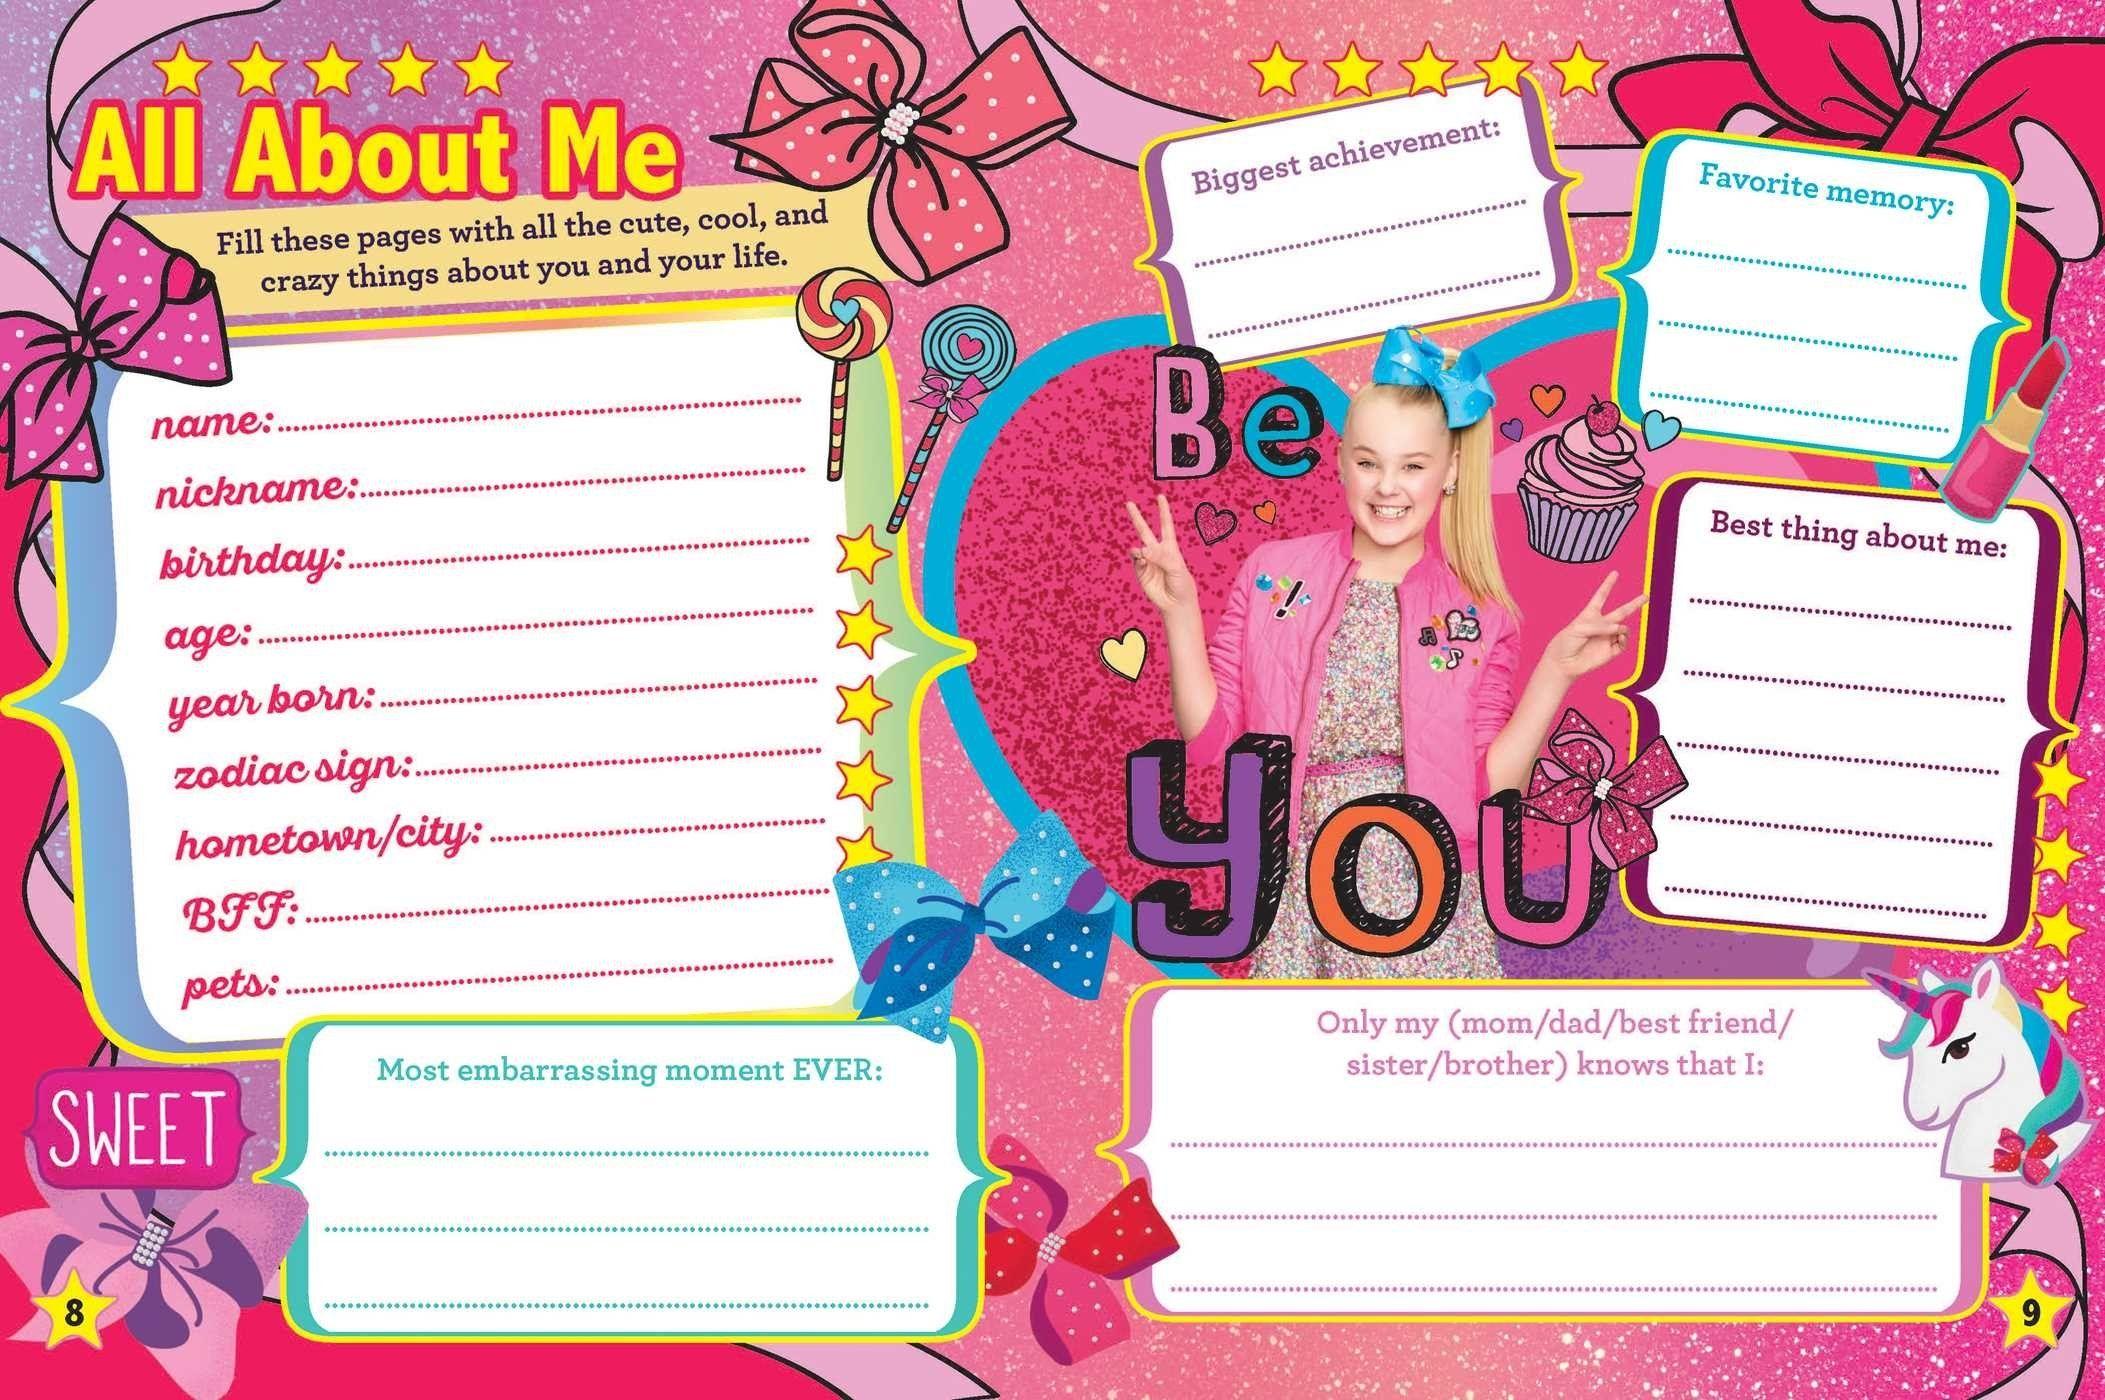 Jojo Siwa Coloring Pages Jojo Siwa Coloring Pages Free Printable For Kids With Jojo Siwa Albanysinsanity Com Coloring Books Coloring Pages Coloring Pages Inspirational